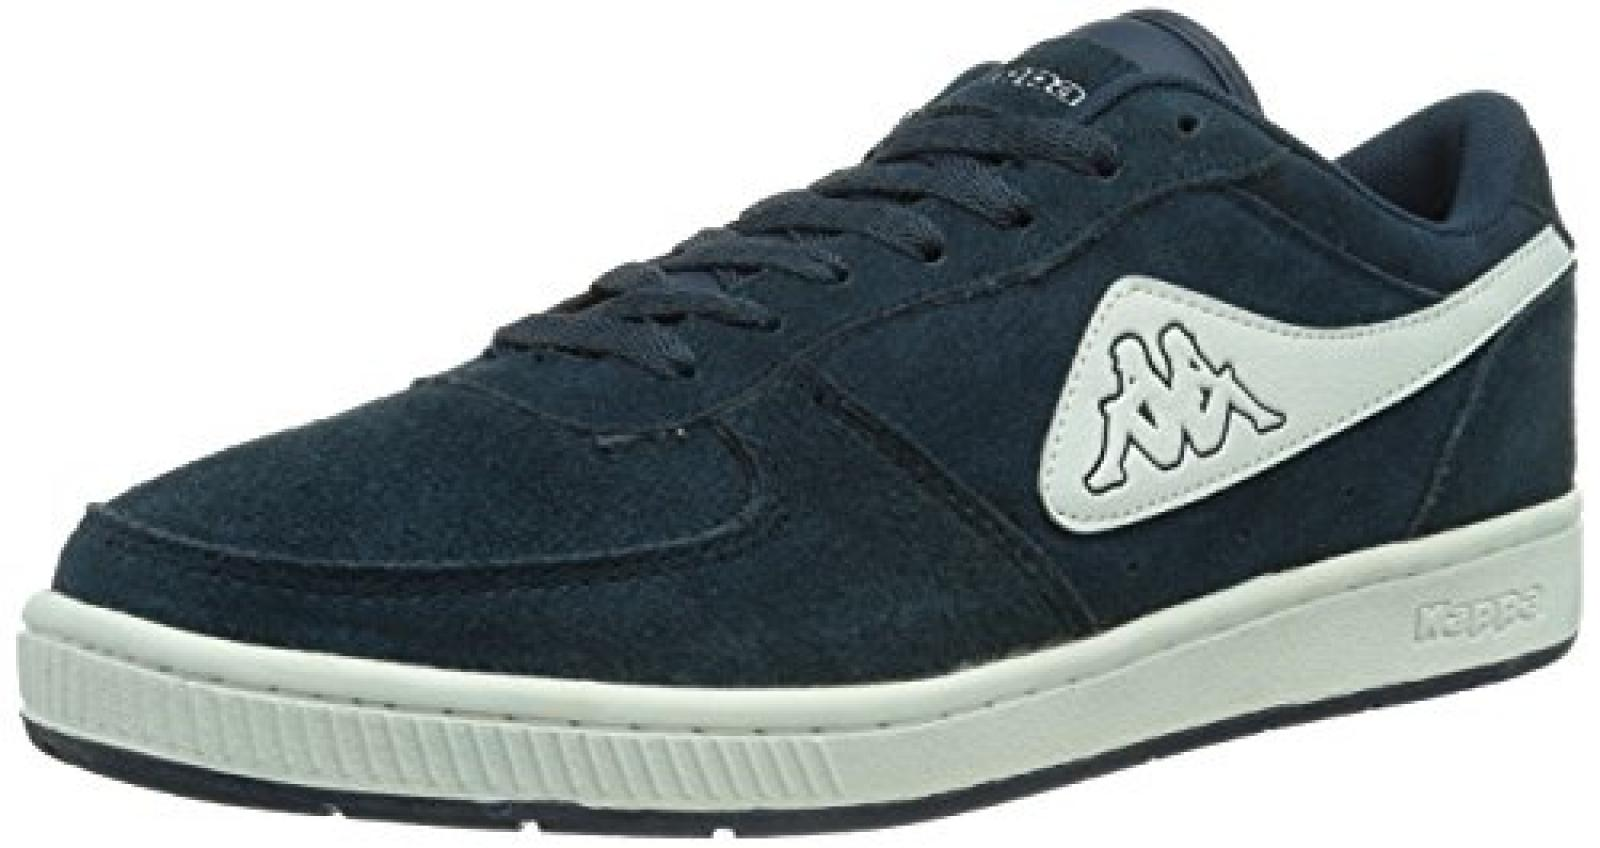 Kappa TROOPER DELUXE Footwear Herren Sneakers